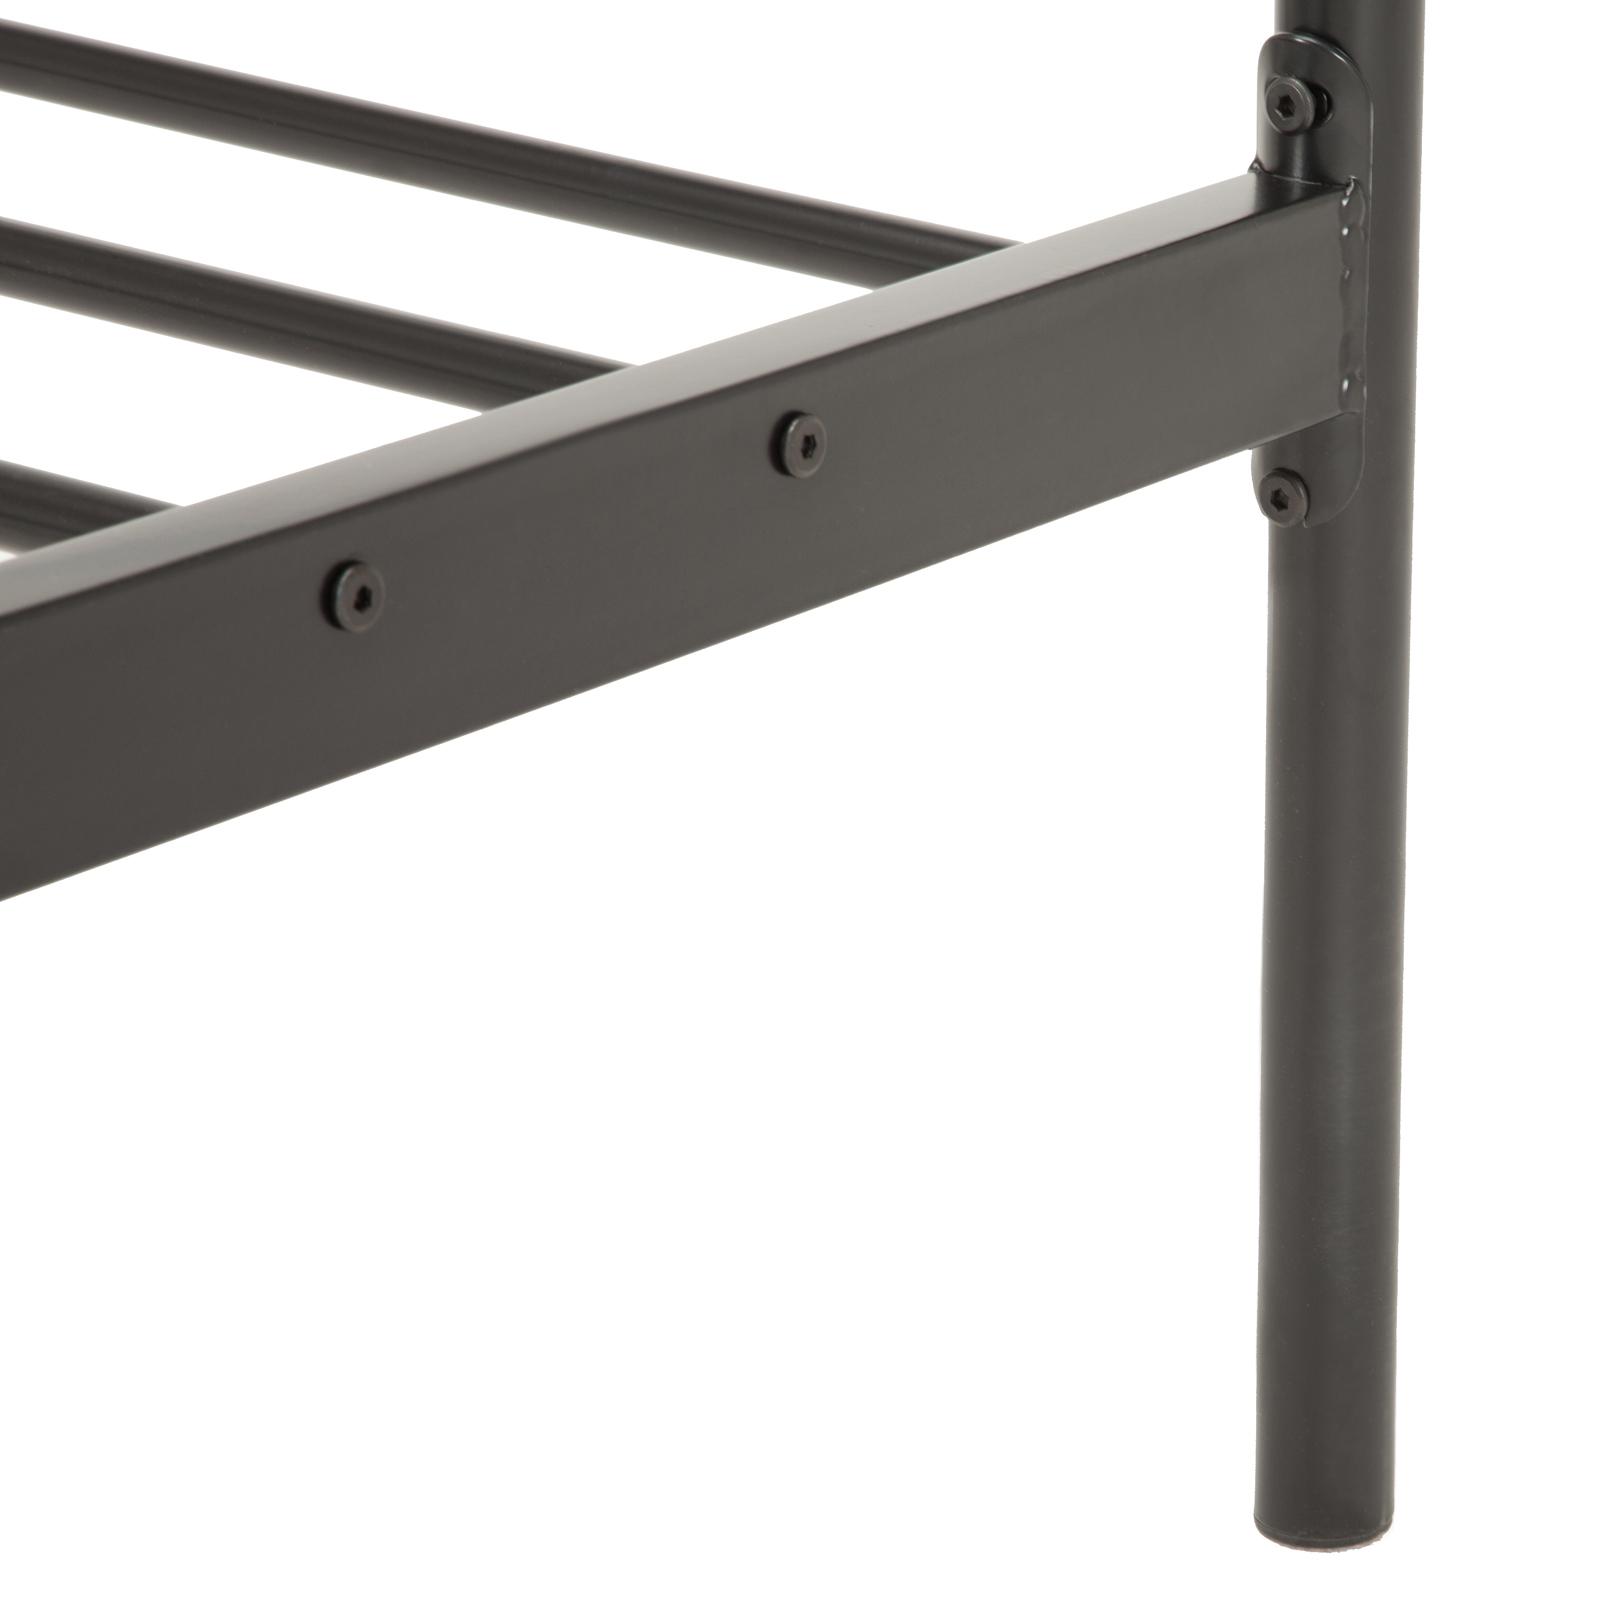 twin full queen size metal bed frame platform - Full Size Metal Bed Frames